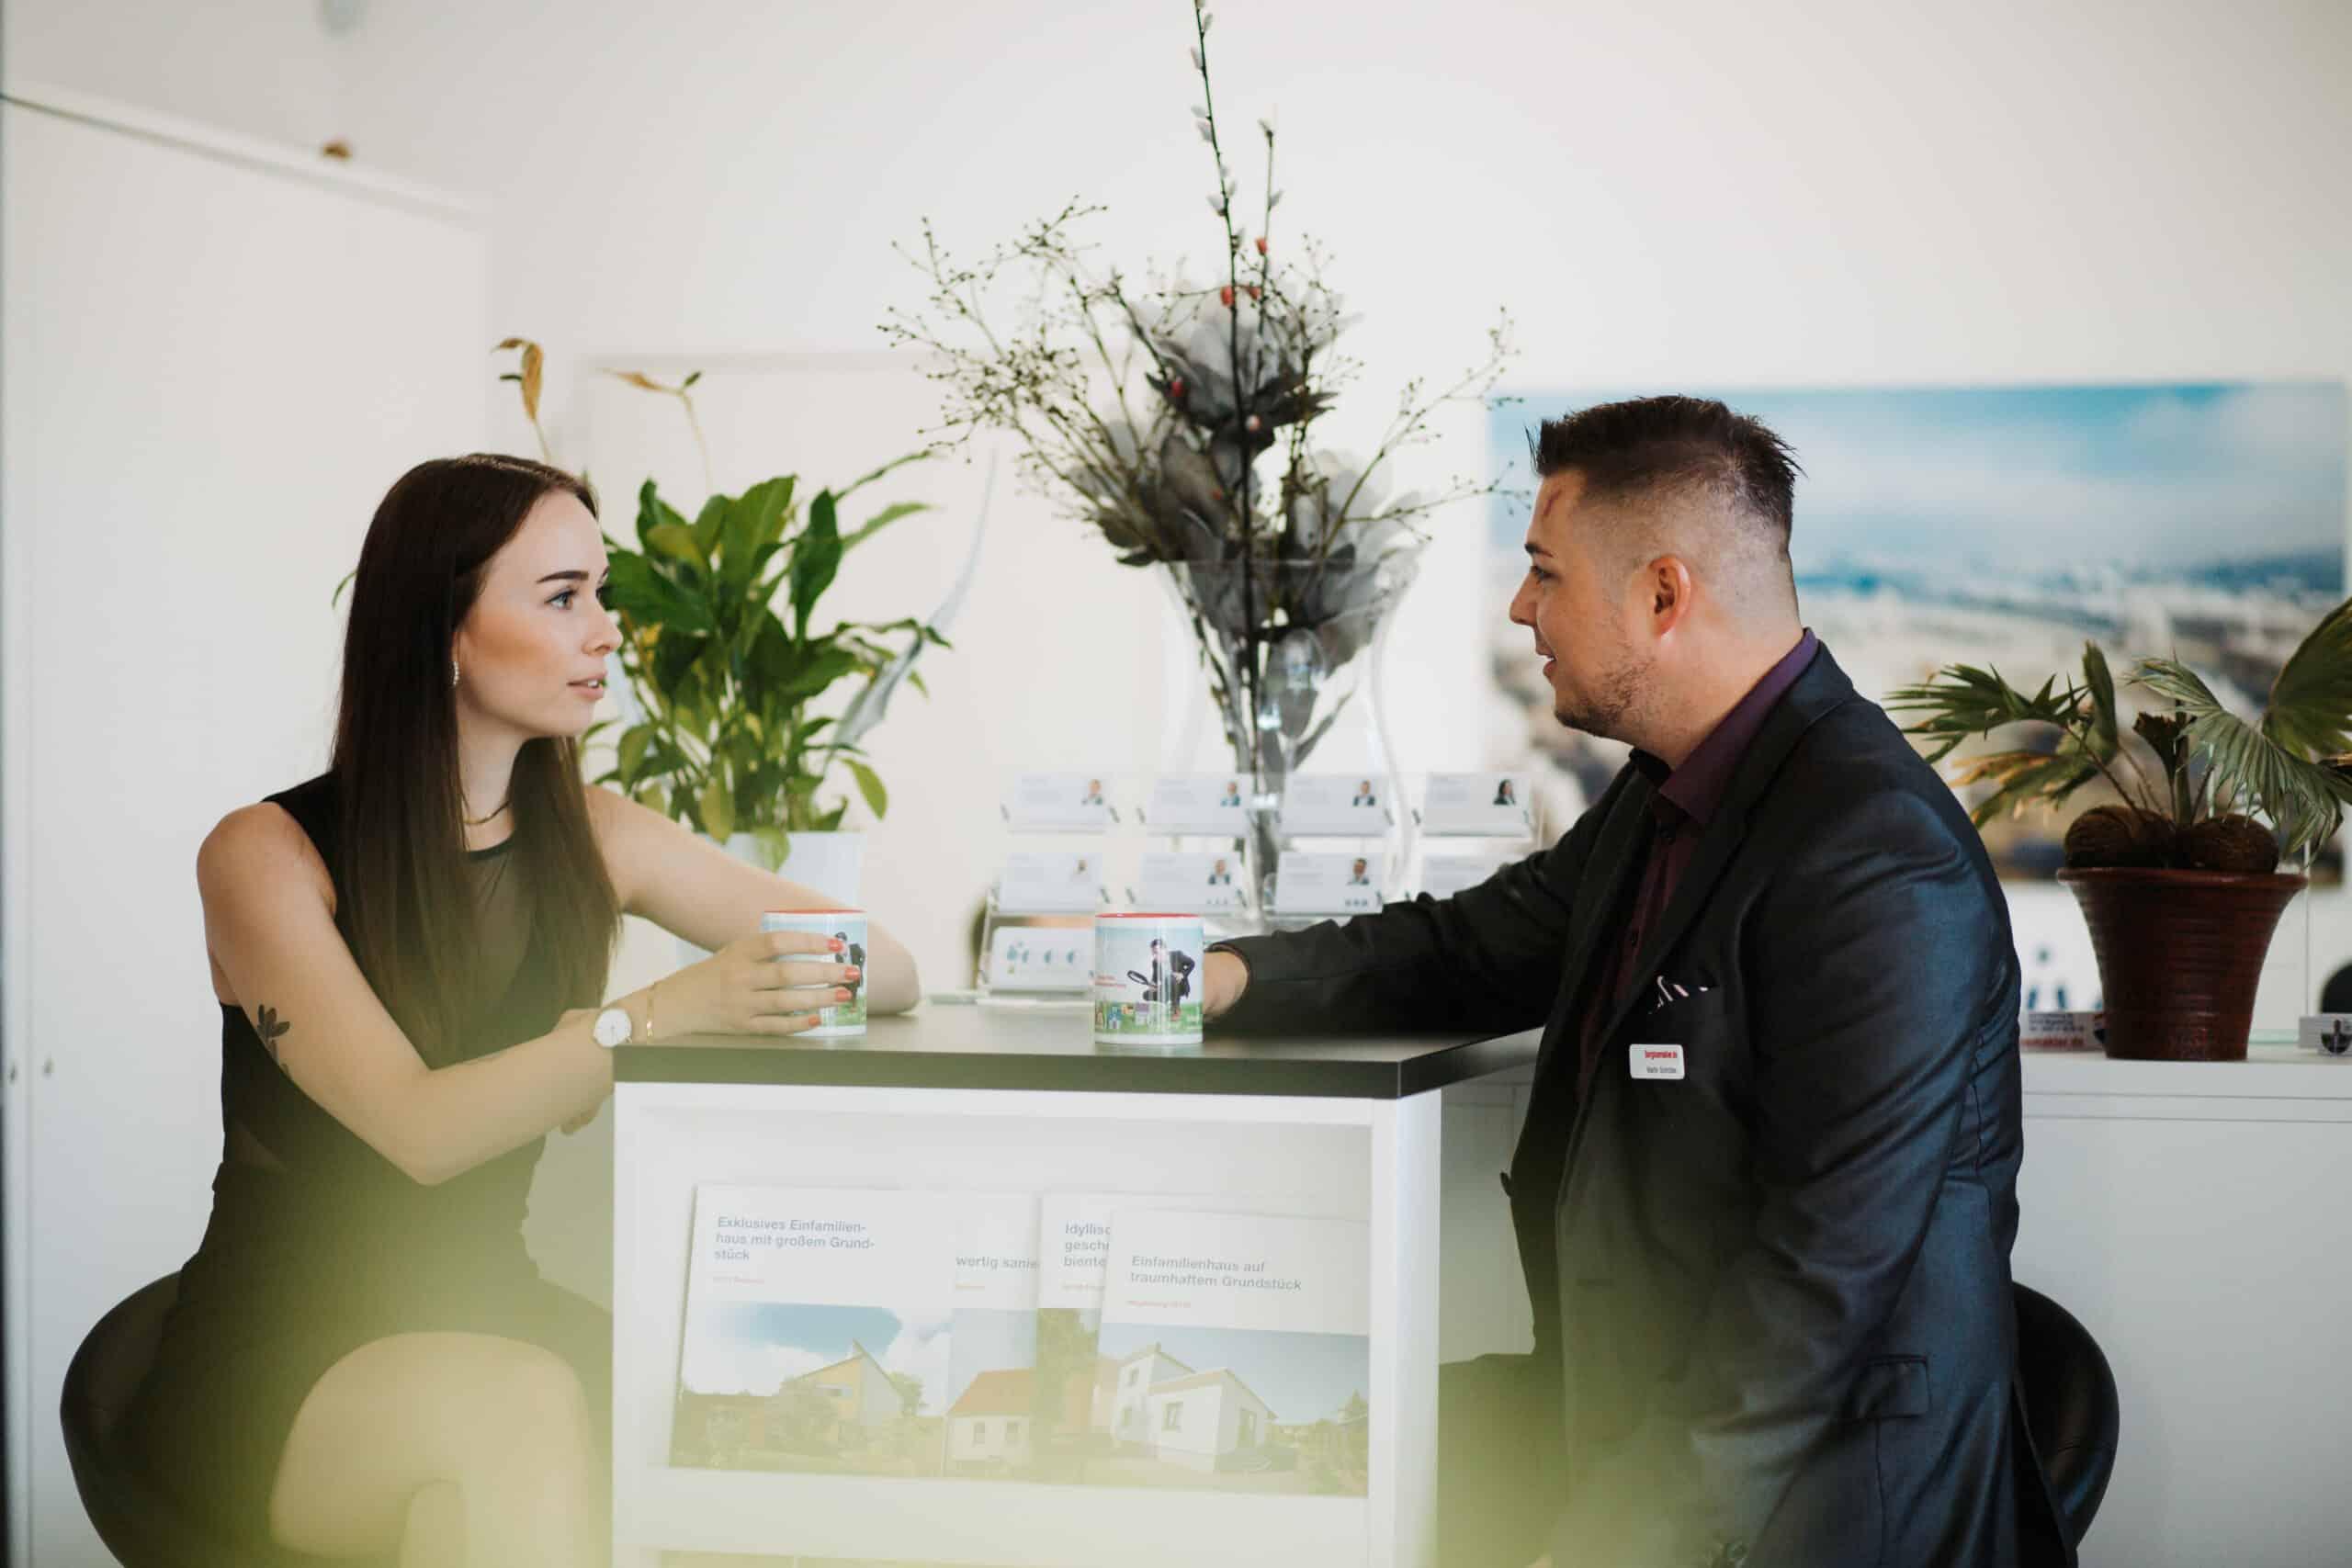 Ausbildung zum Immobilienmakler-mann-frau